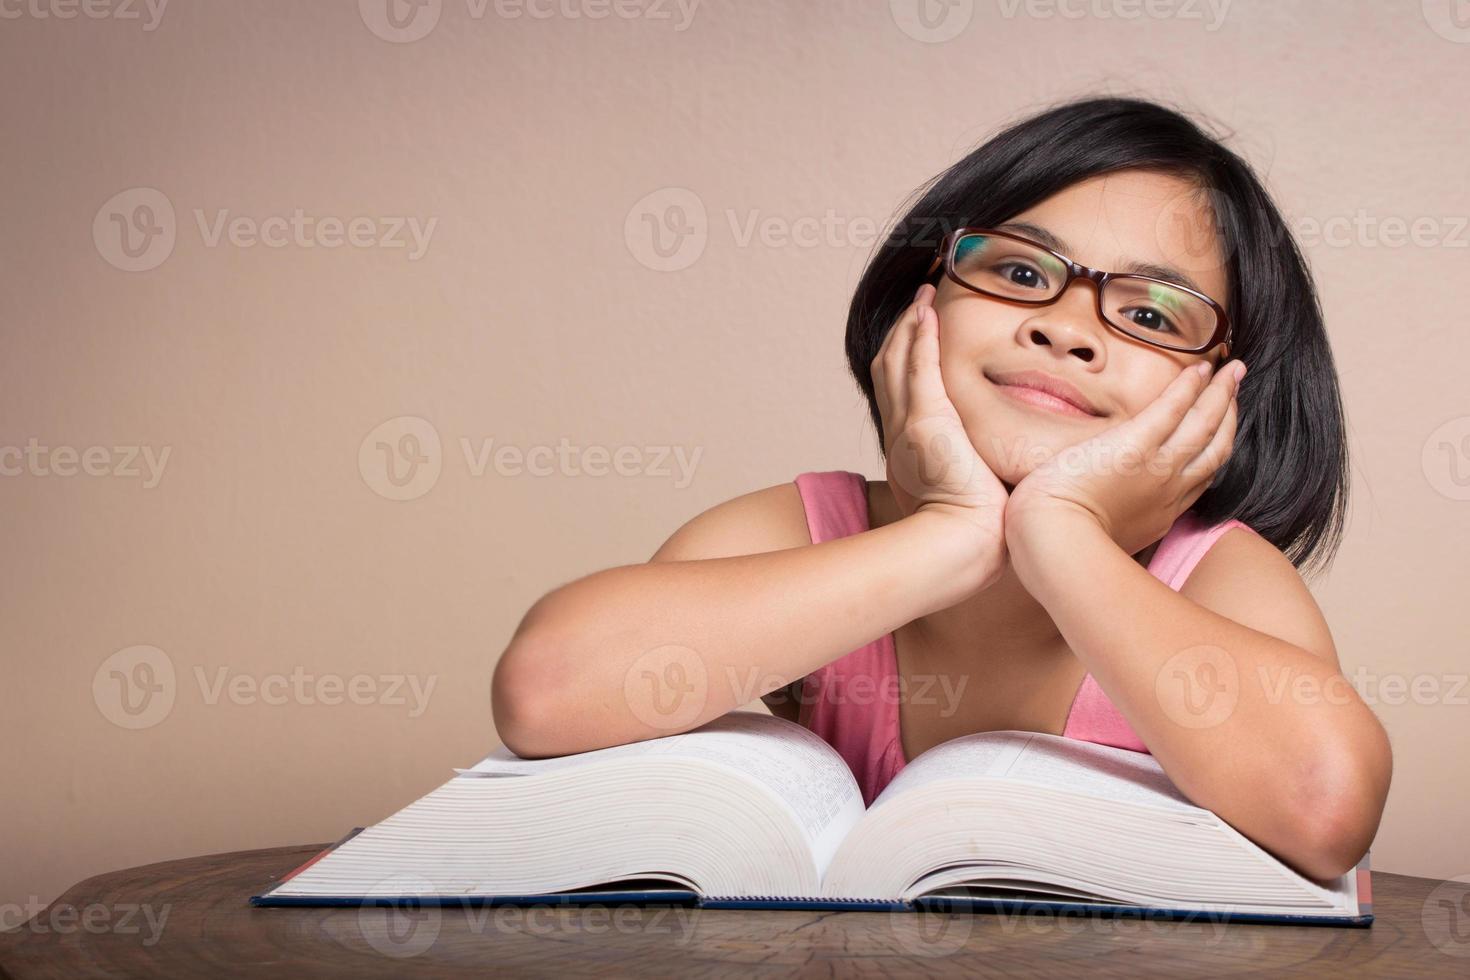 Chica relajarse leyendo un libro. foto